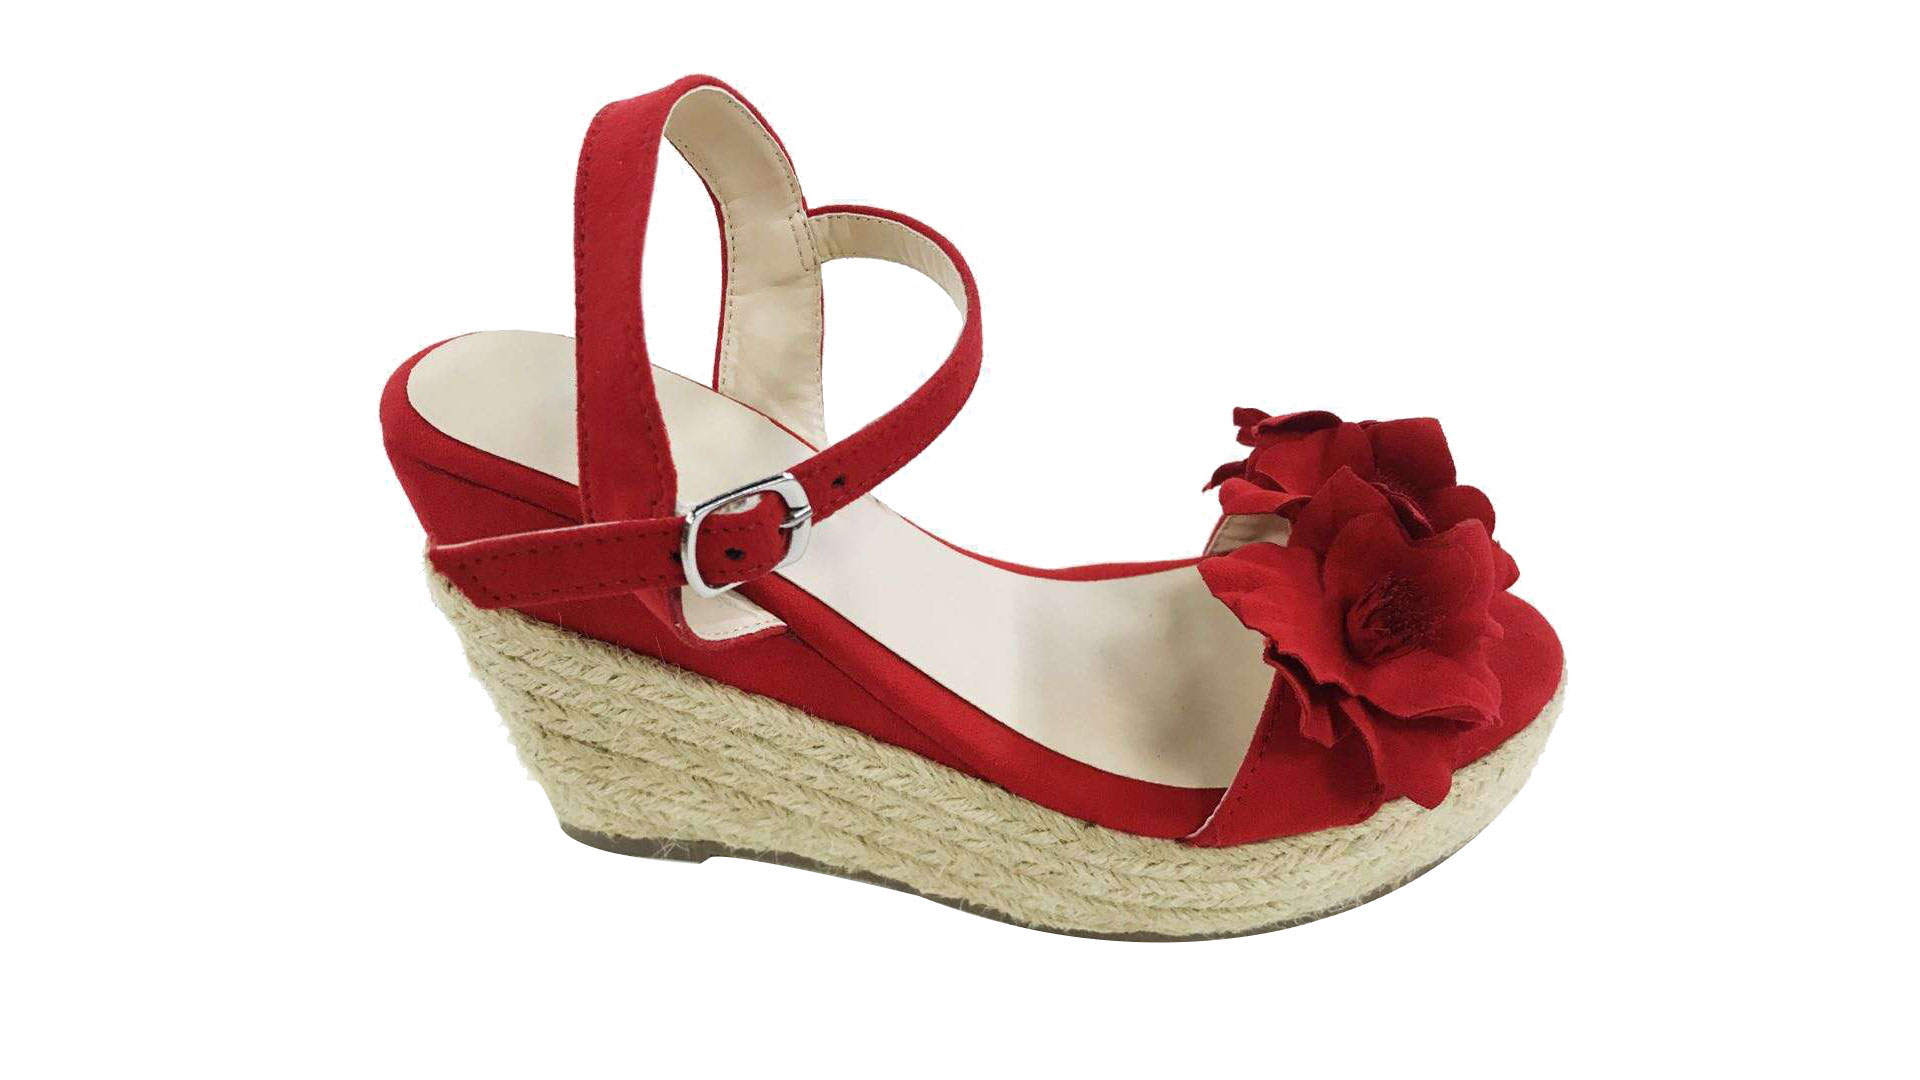 Wholesale Flower Wedge Heel Shoes For Women